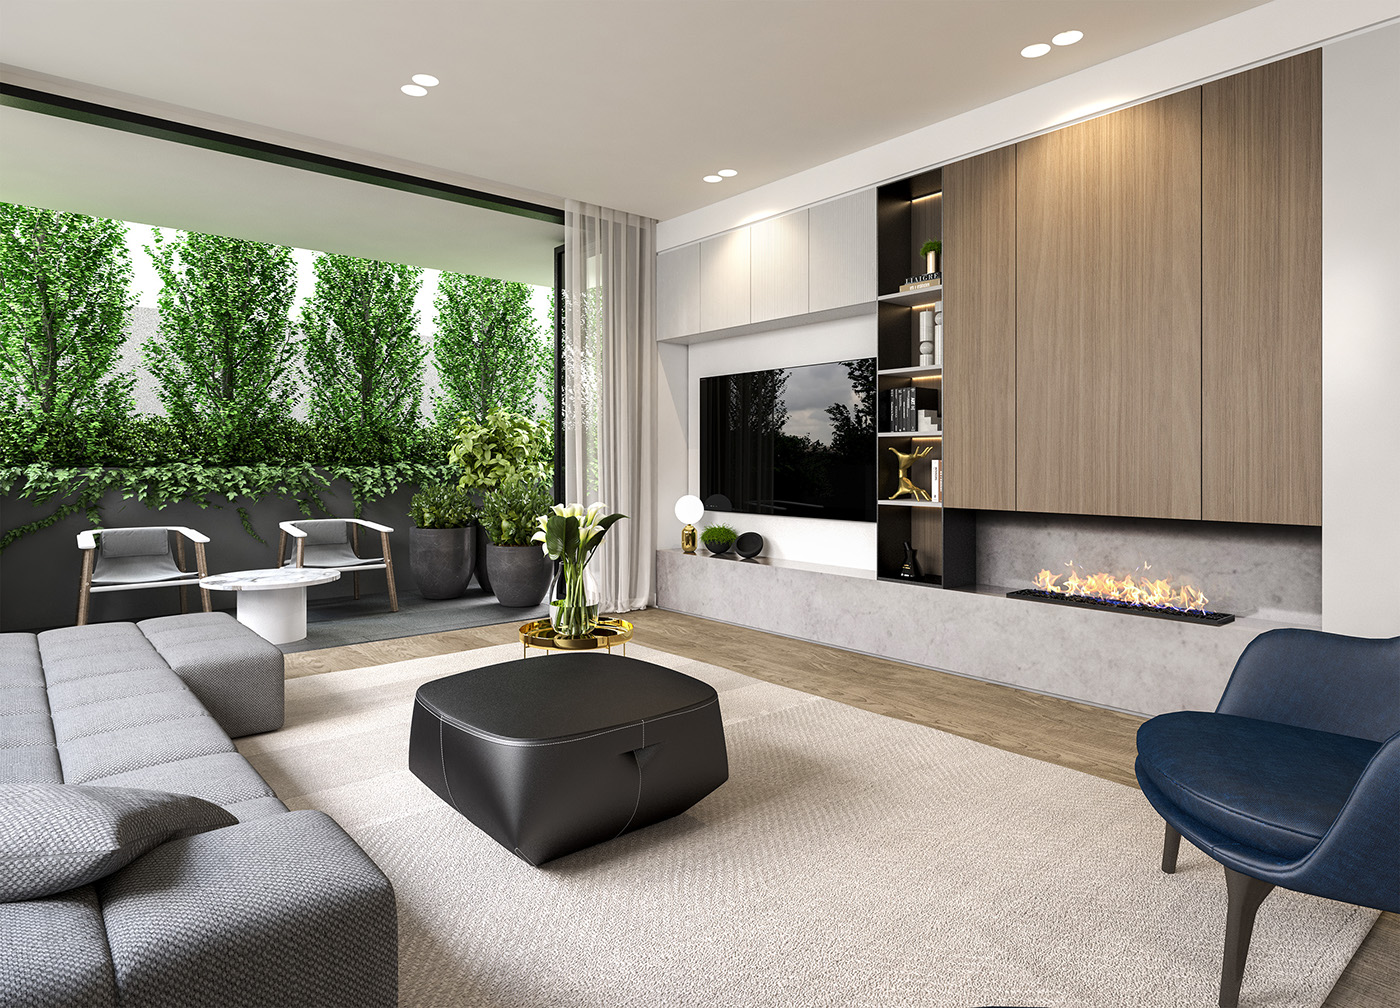 CONCERTO BRIGHTON Apartments On Behance